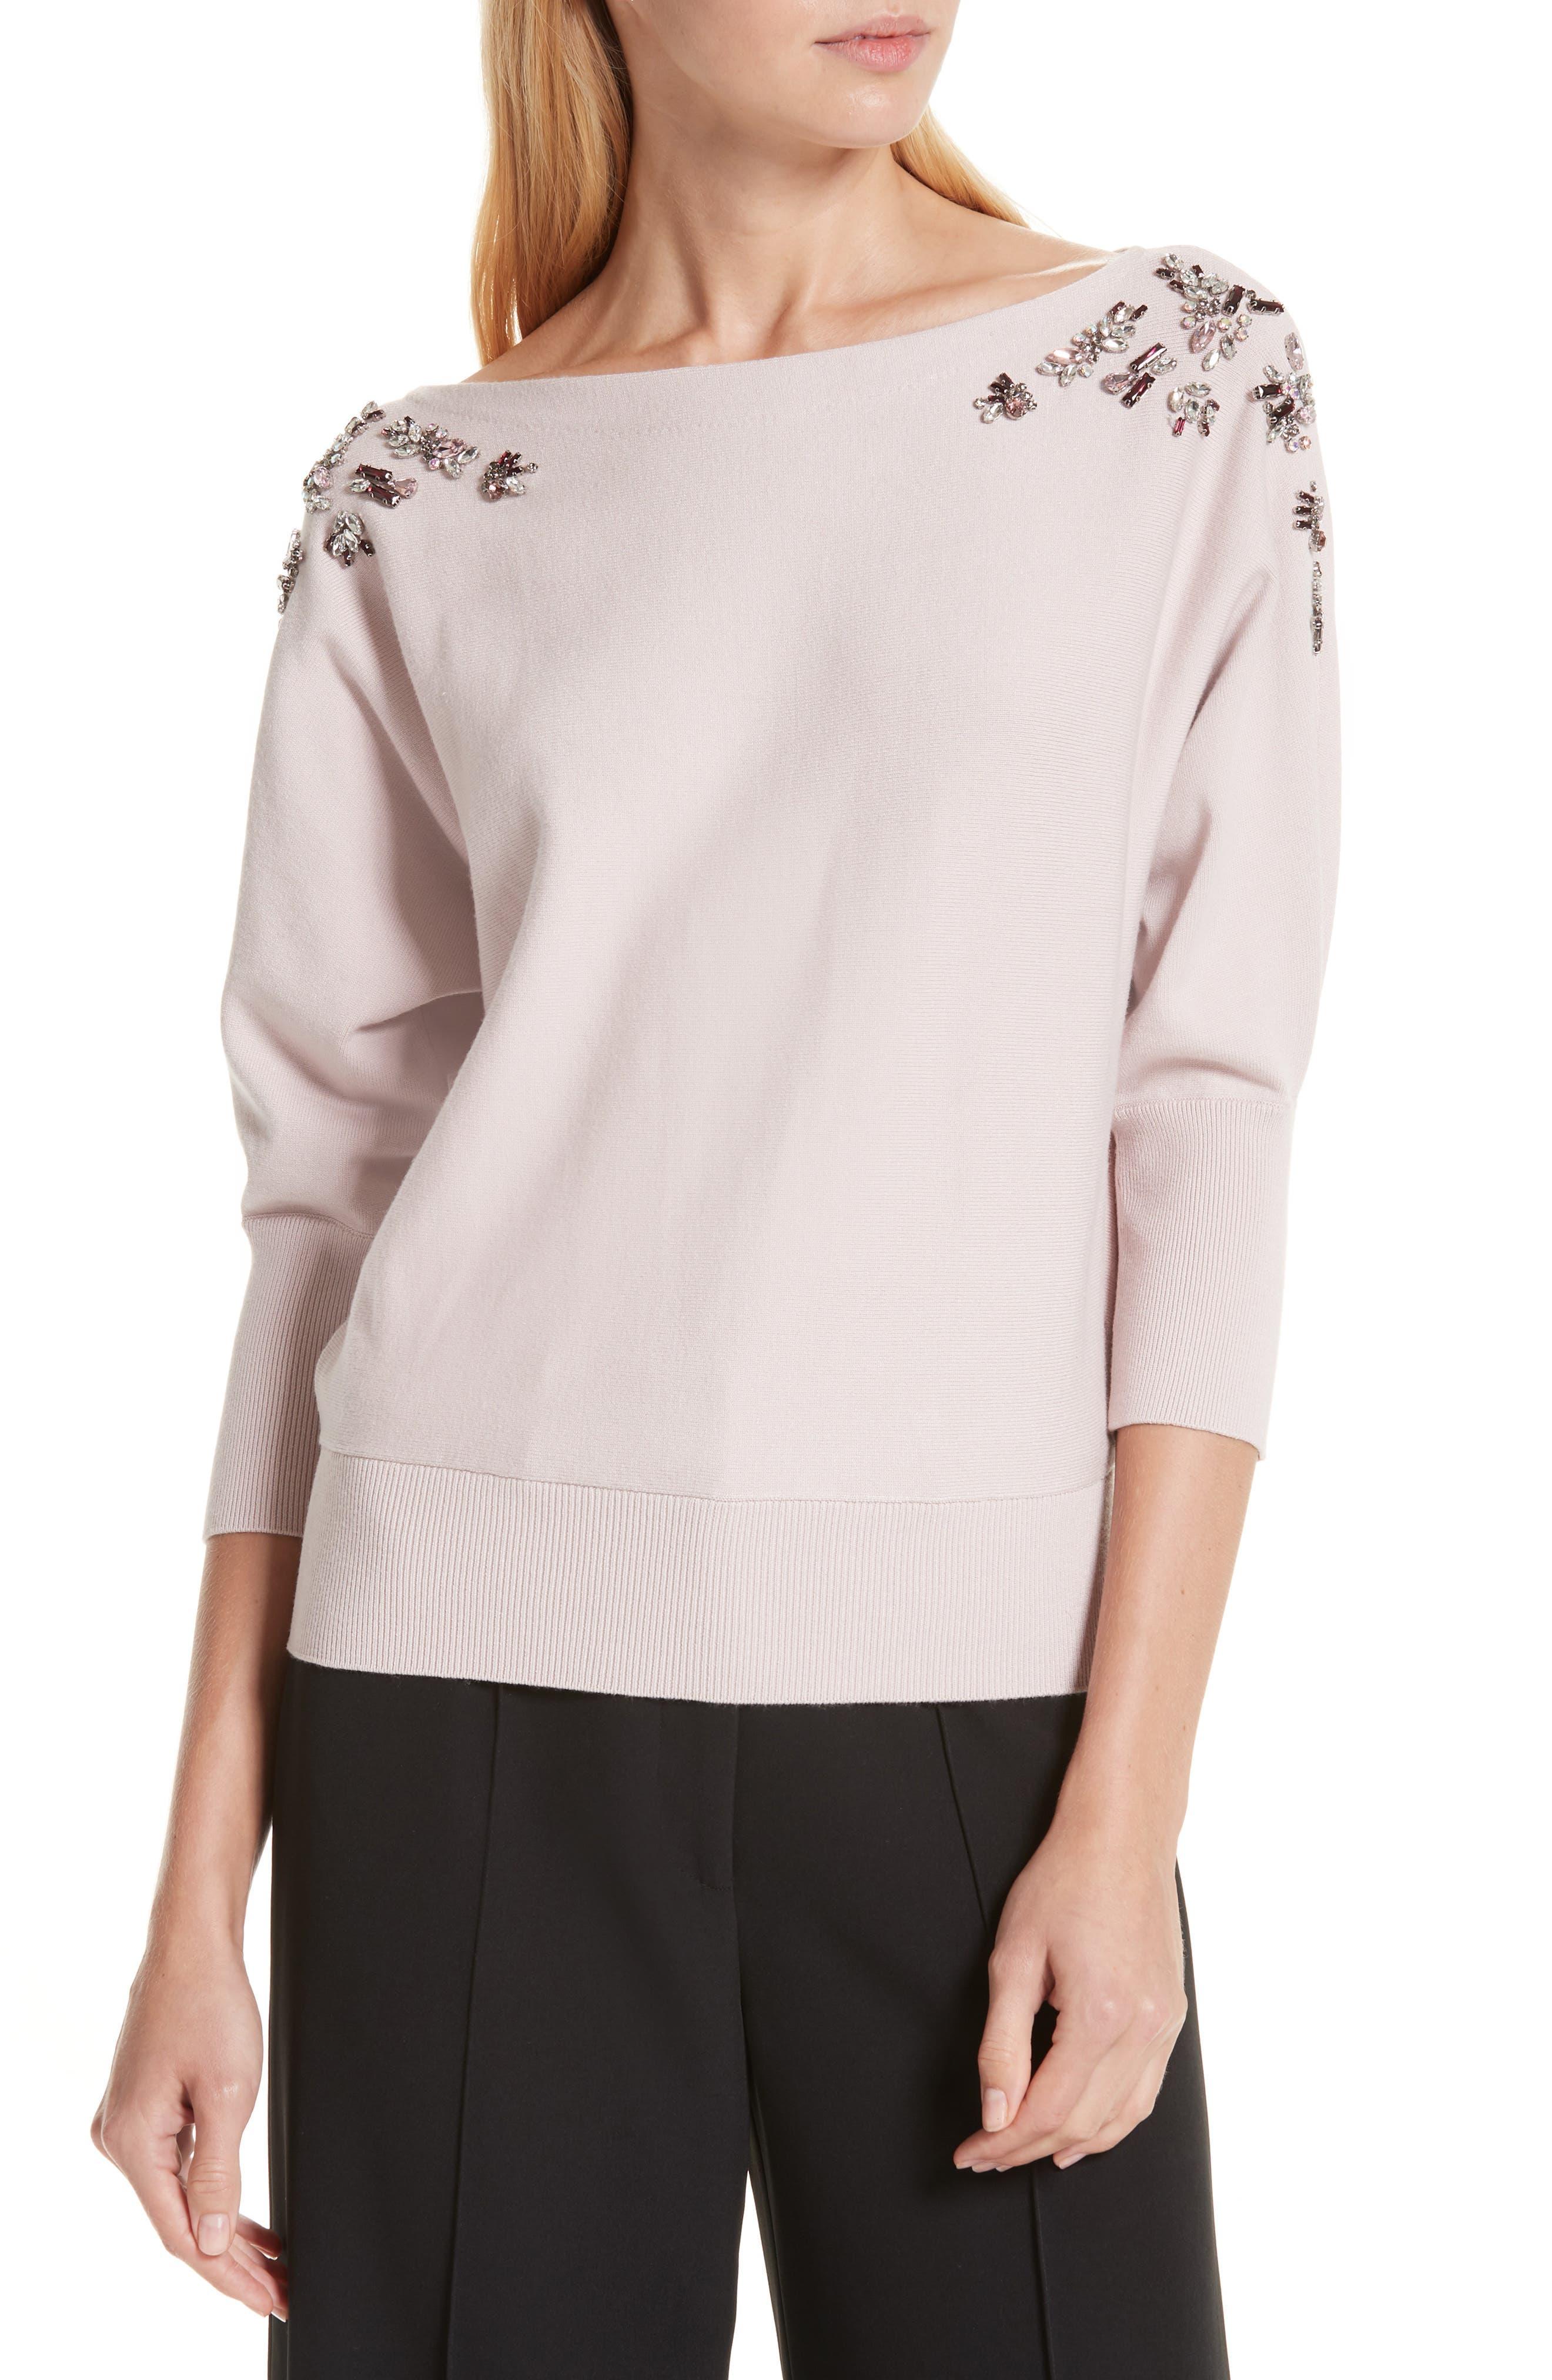 MILLY Faux Gem Embellished Sweater, Main, color, BALLET